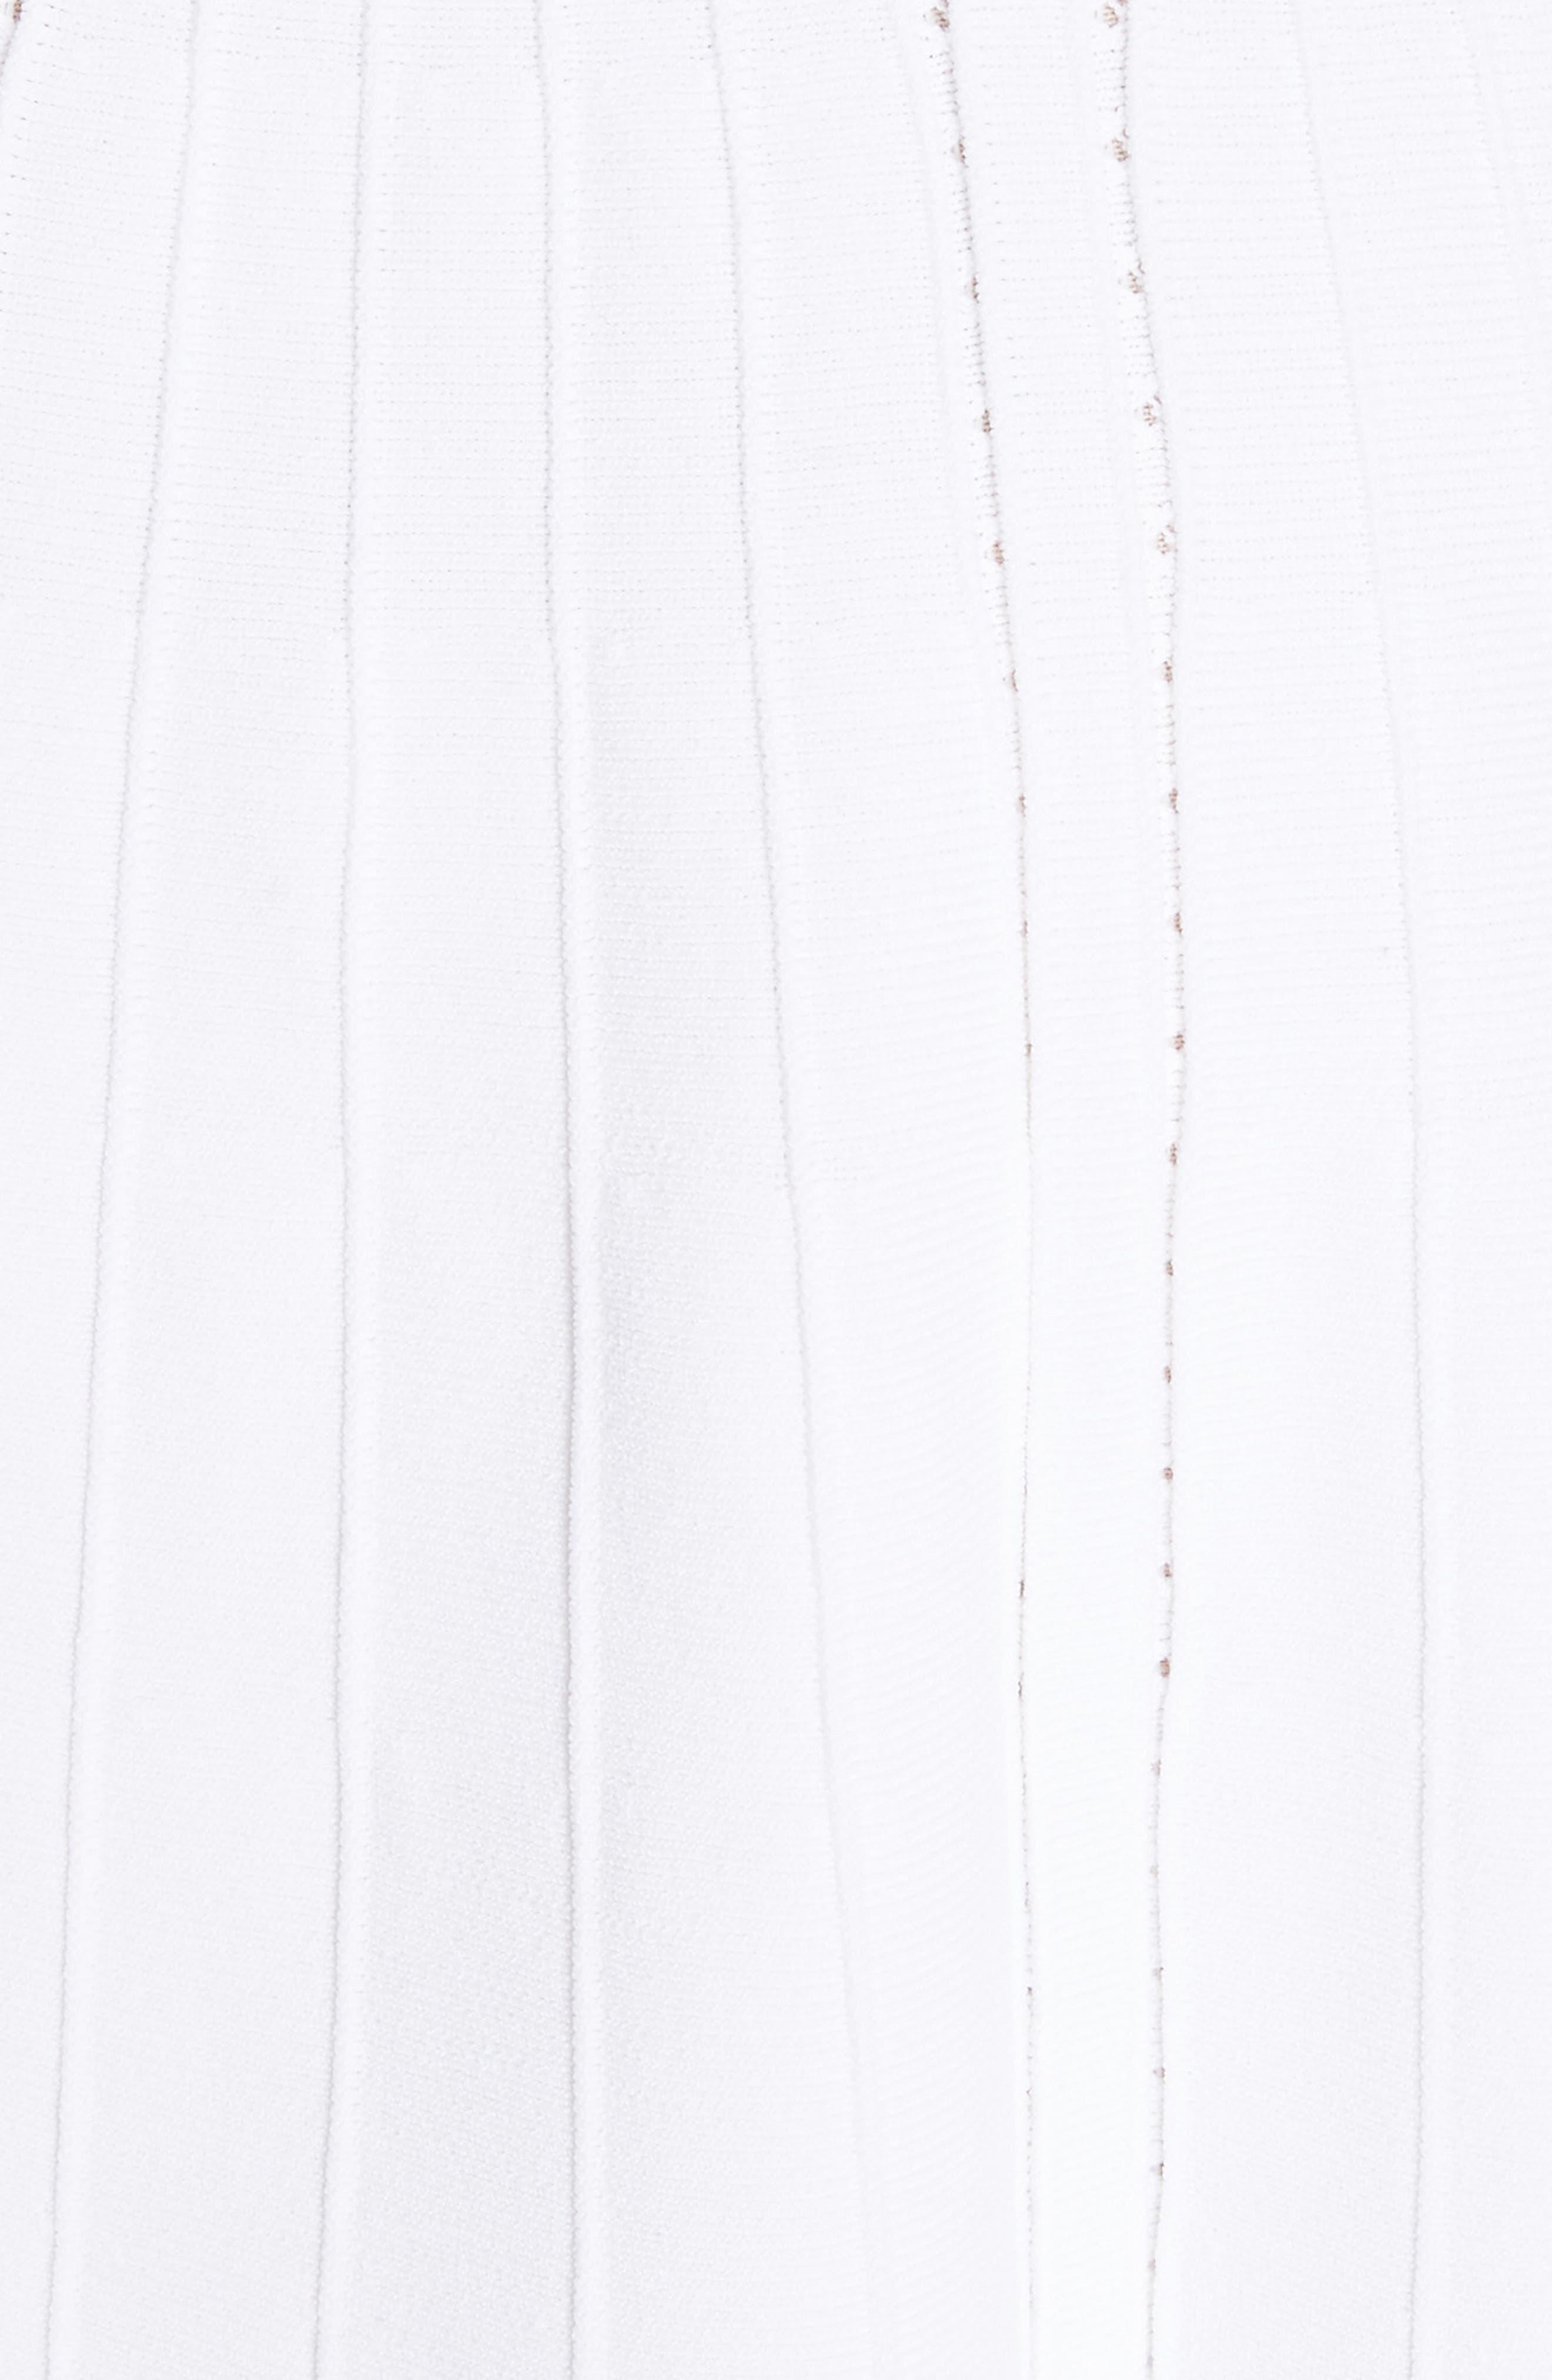 Janella Ruffled Off the Shoulder Dress,                             Alternate thumbnail 5, color,                             Optic White